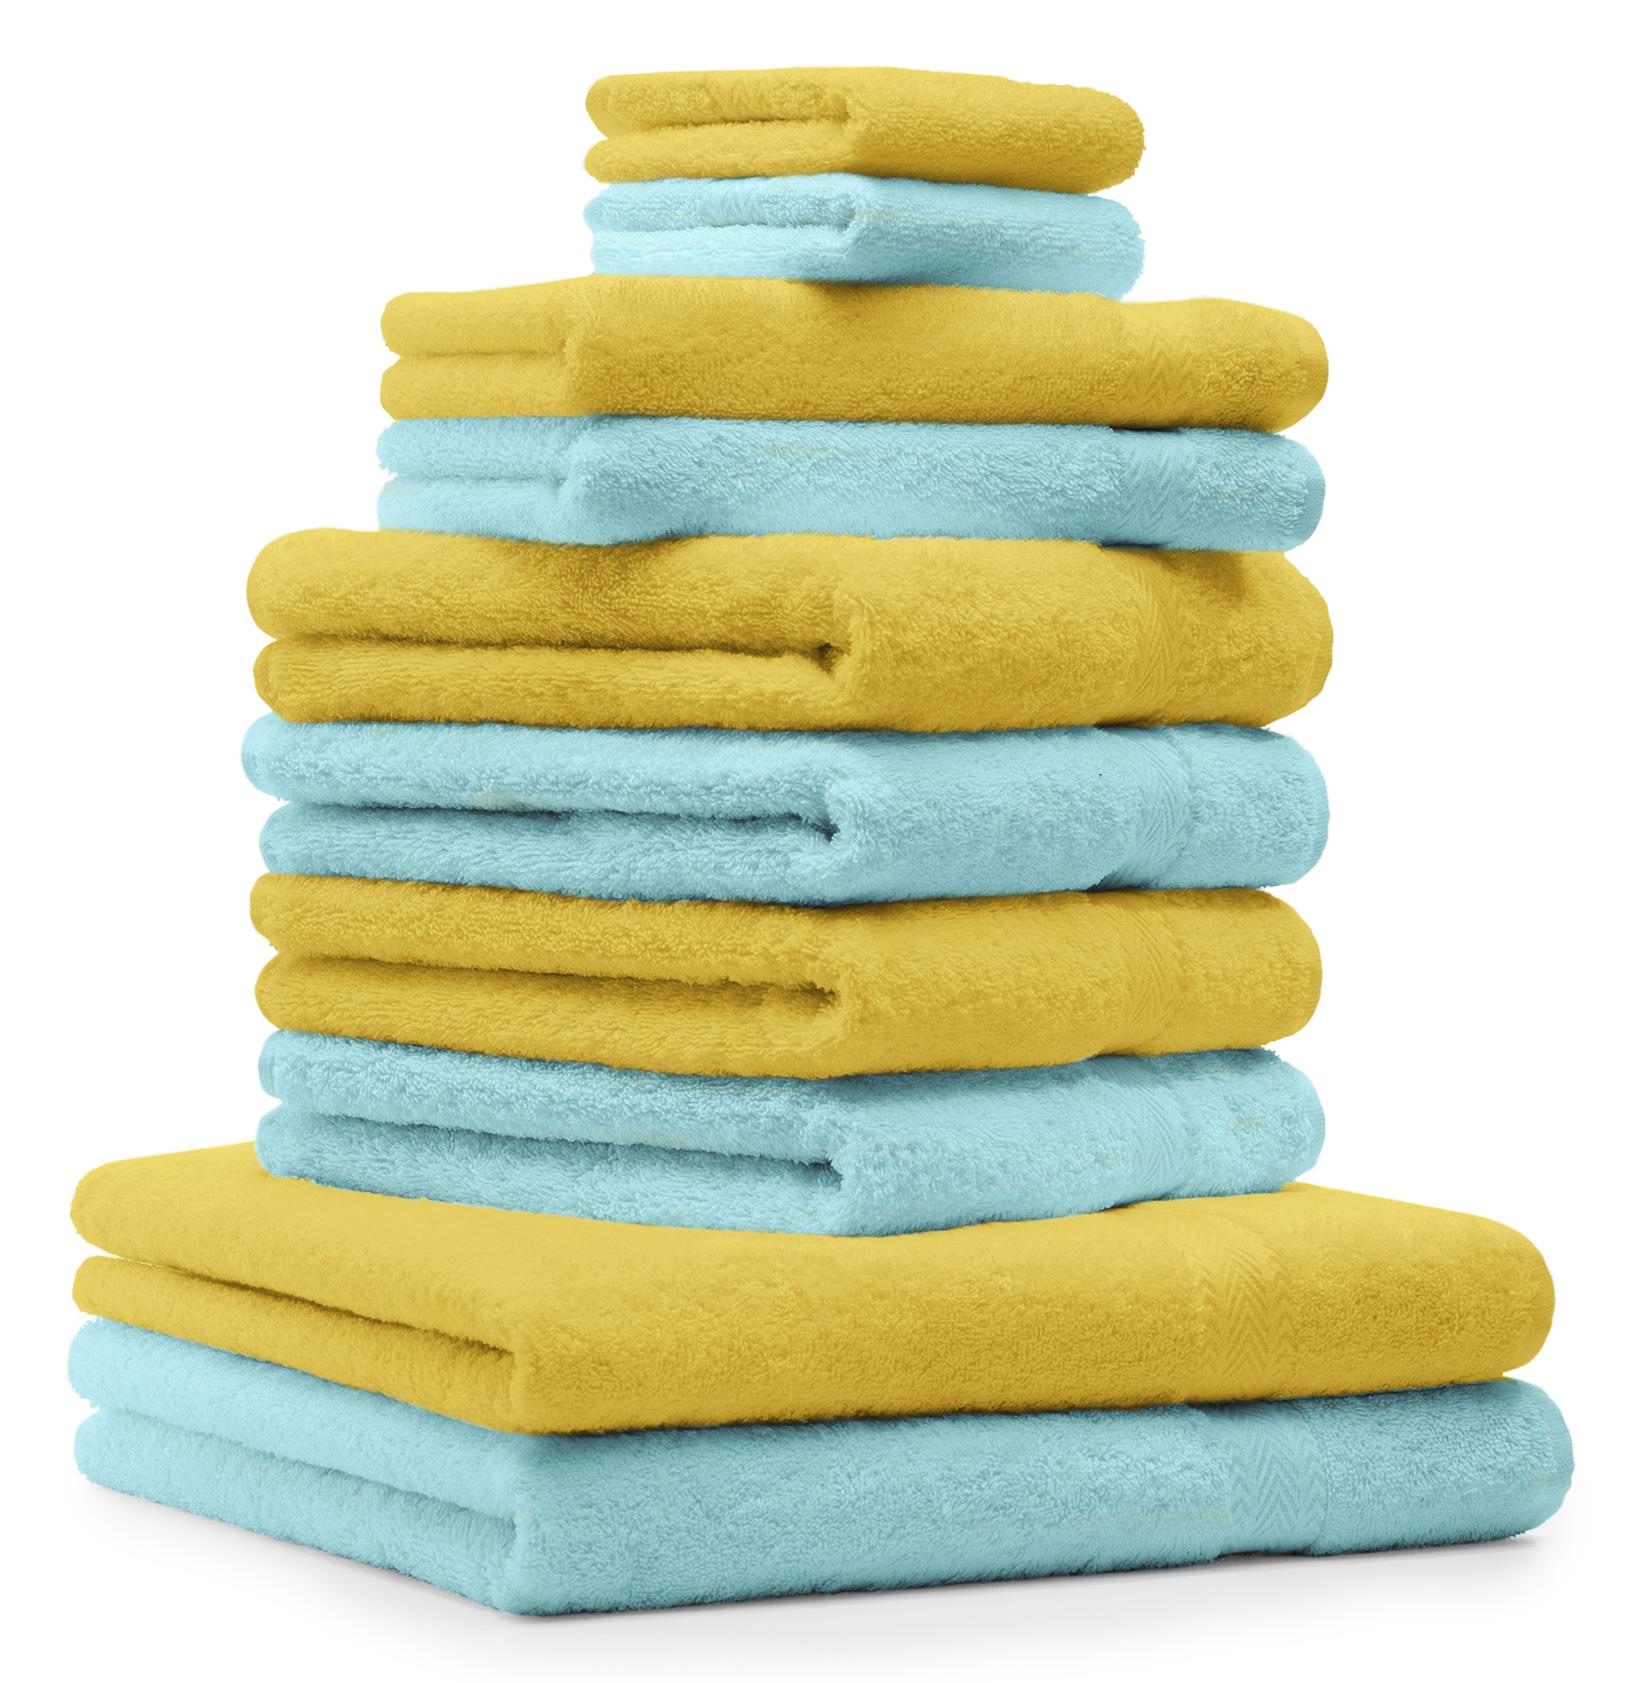 10 tlg handtuchset premium gelb t rkis 2 duscht cher. Black Bedroom Furniture Sets. Home Design Ideas